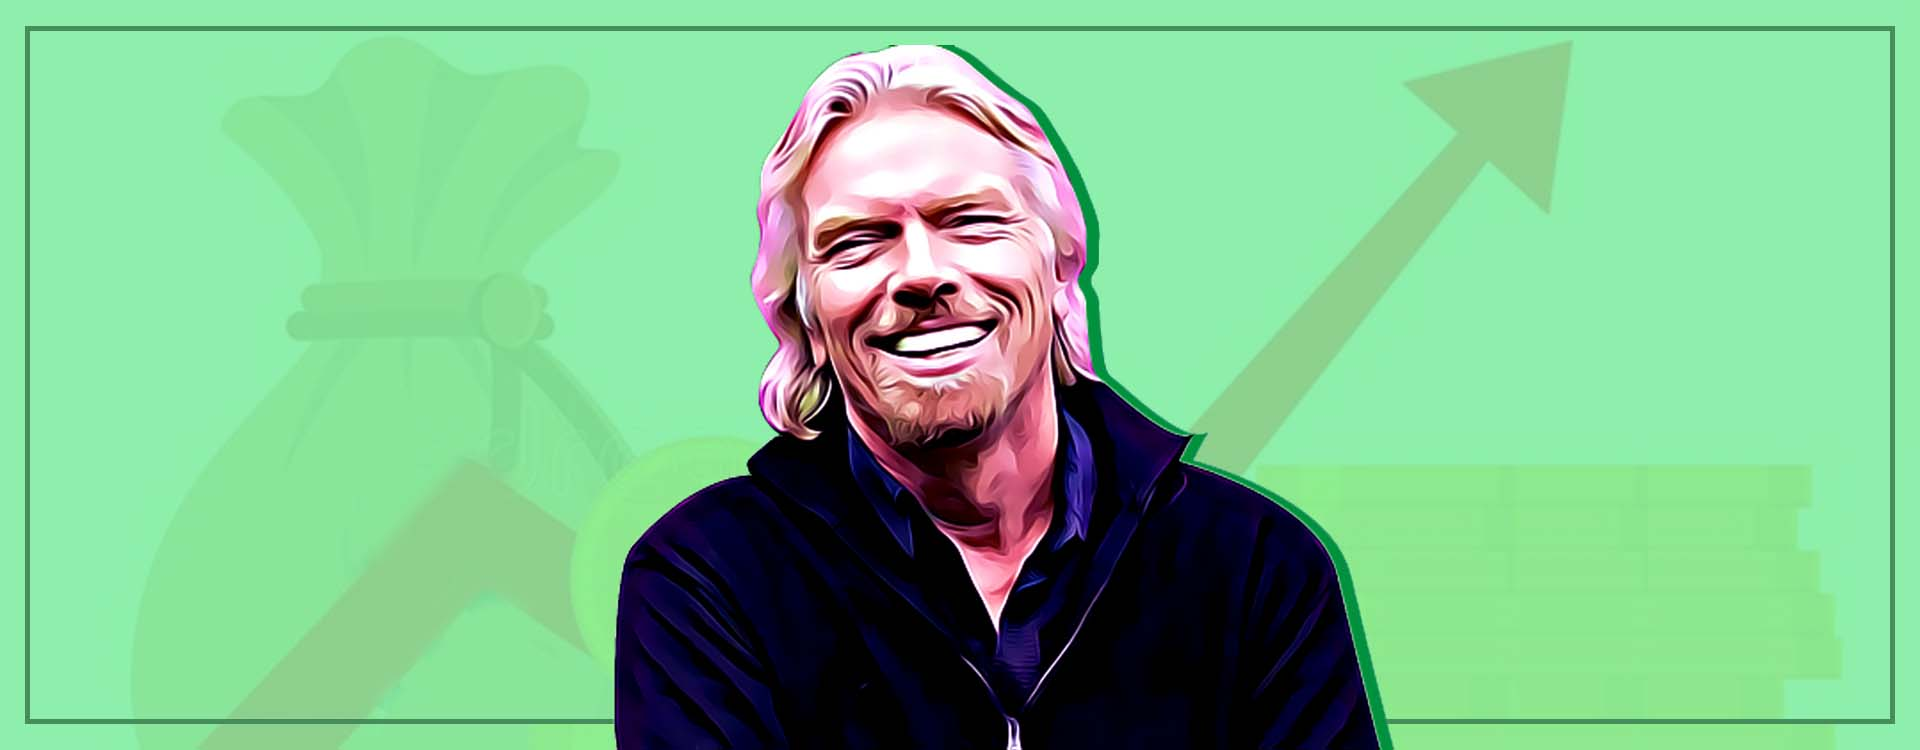 Richard Branson, a Multimillionaire Who Became an Entrepreneur